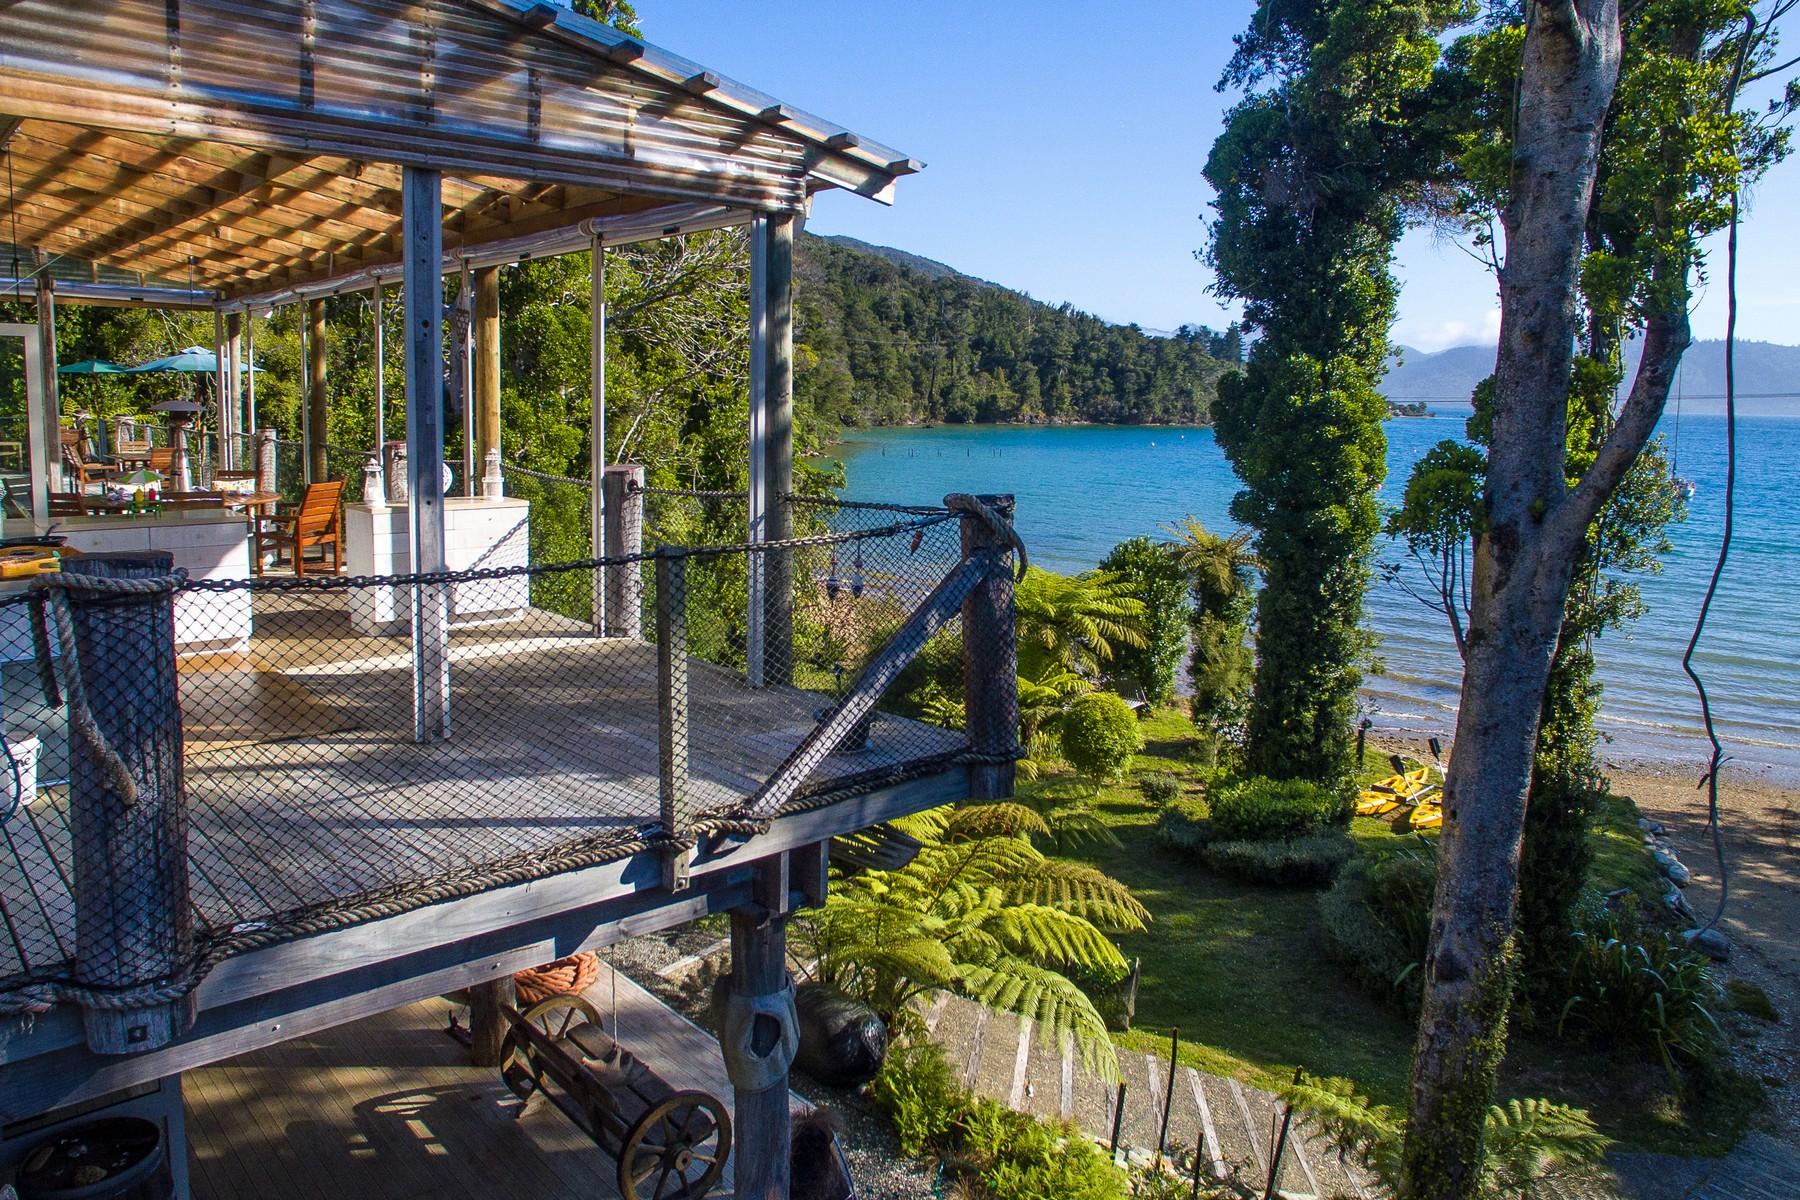 Multi-Family Home for Sale at No Road Inn Marlborough Sounds, Marlborough New Zealand